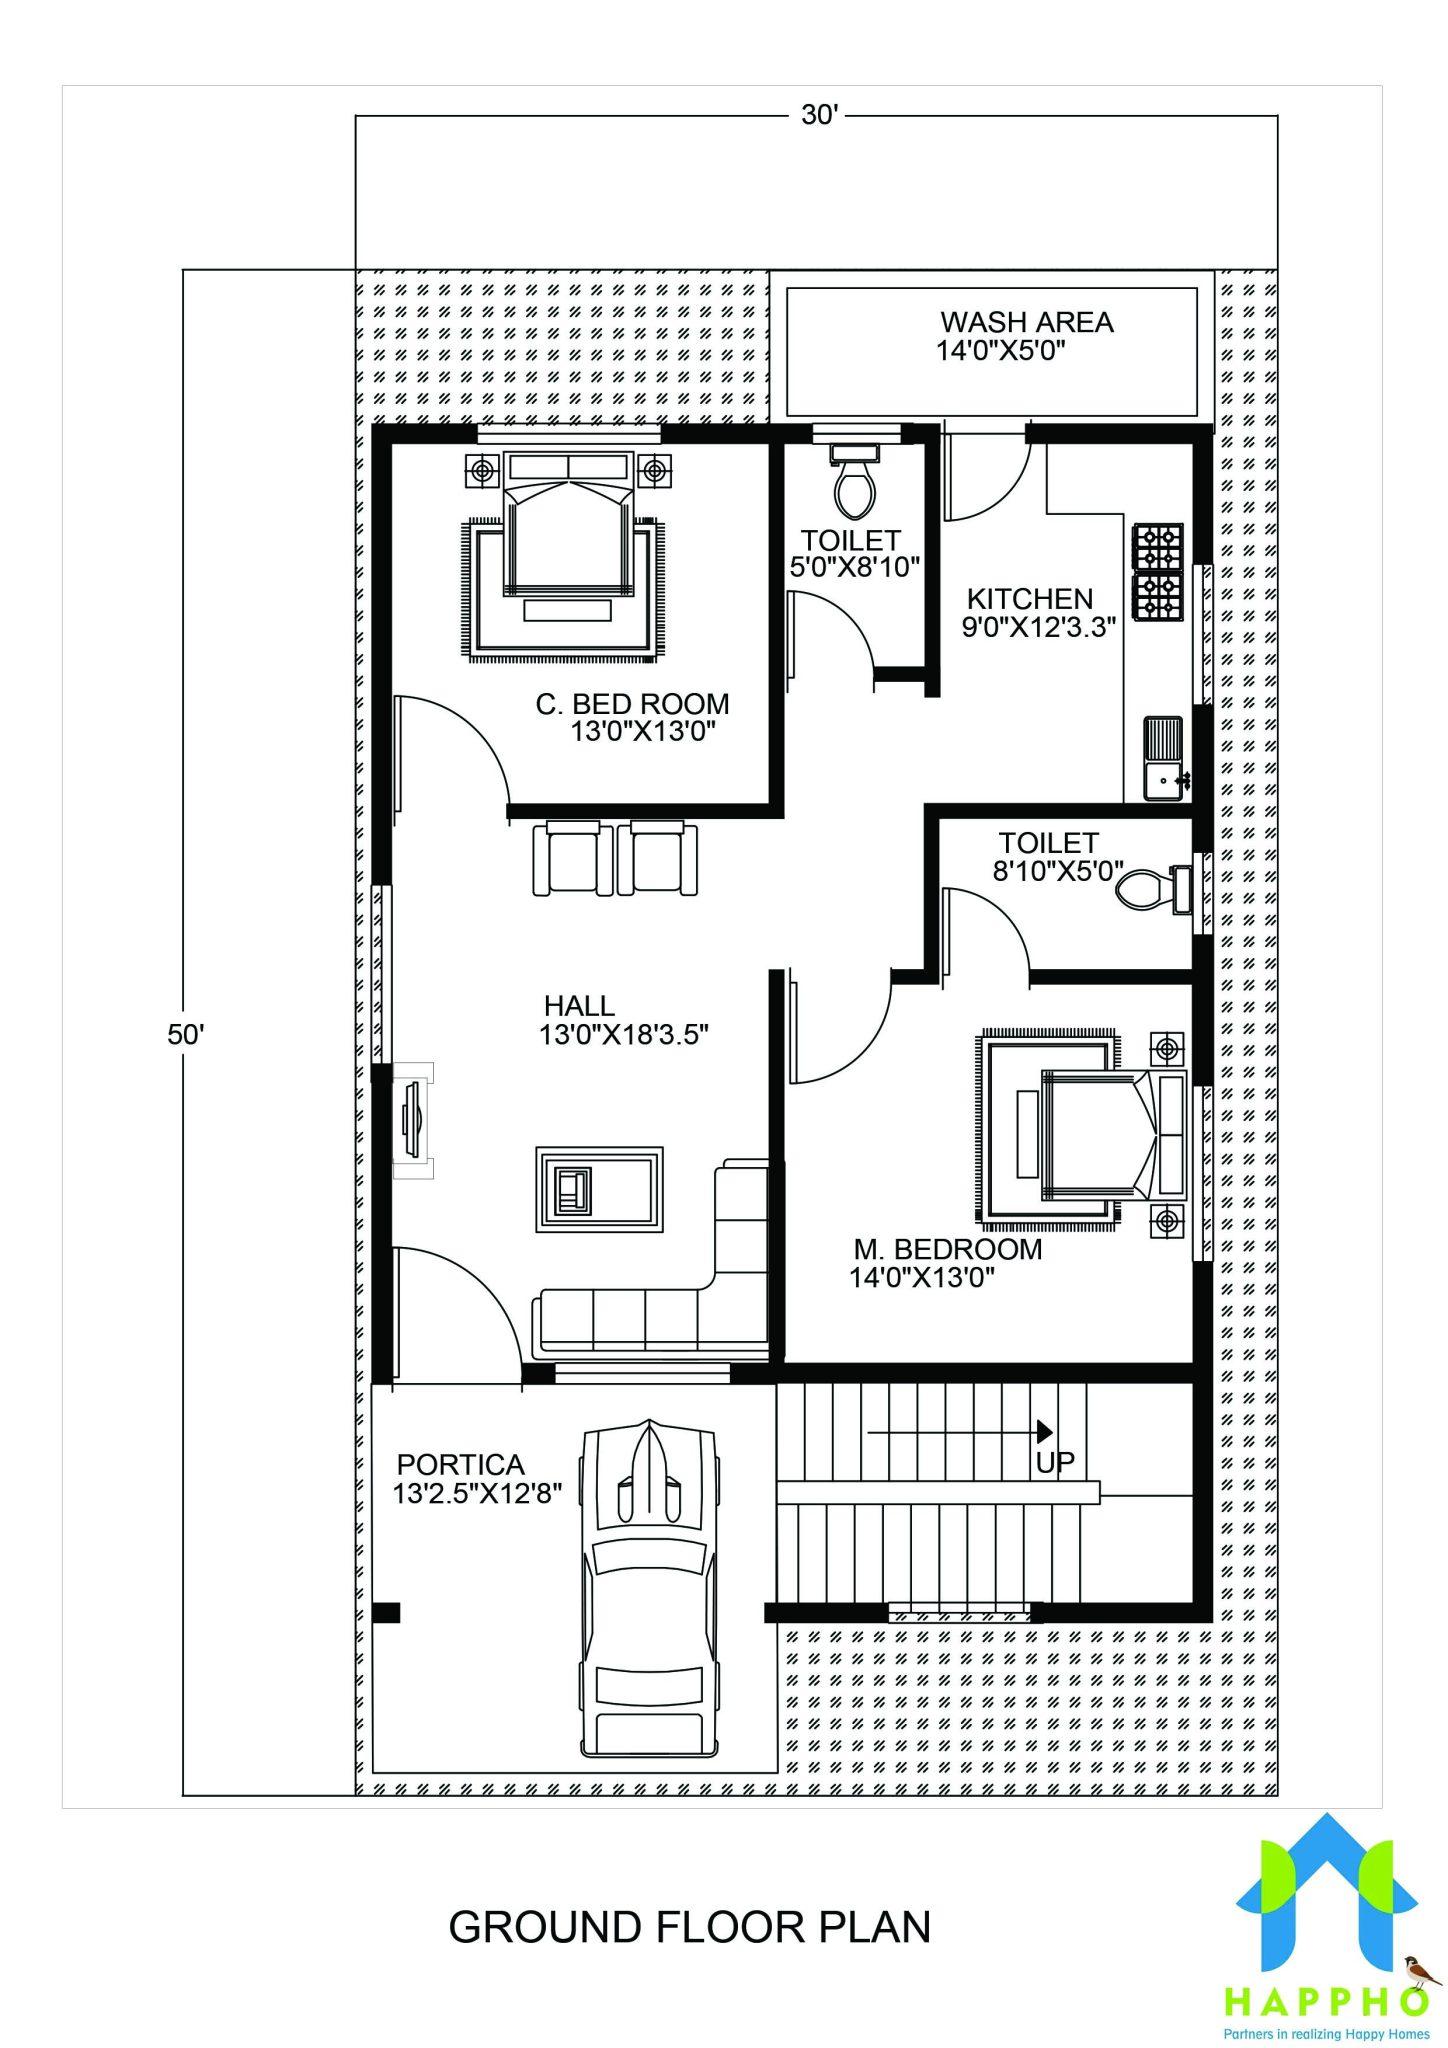 1 bhk floor plan for 20 x 45 feet plot 900 square feet for 50 yards house design